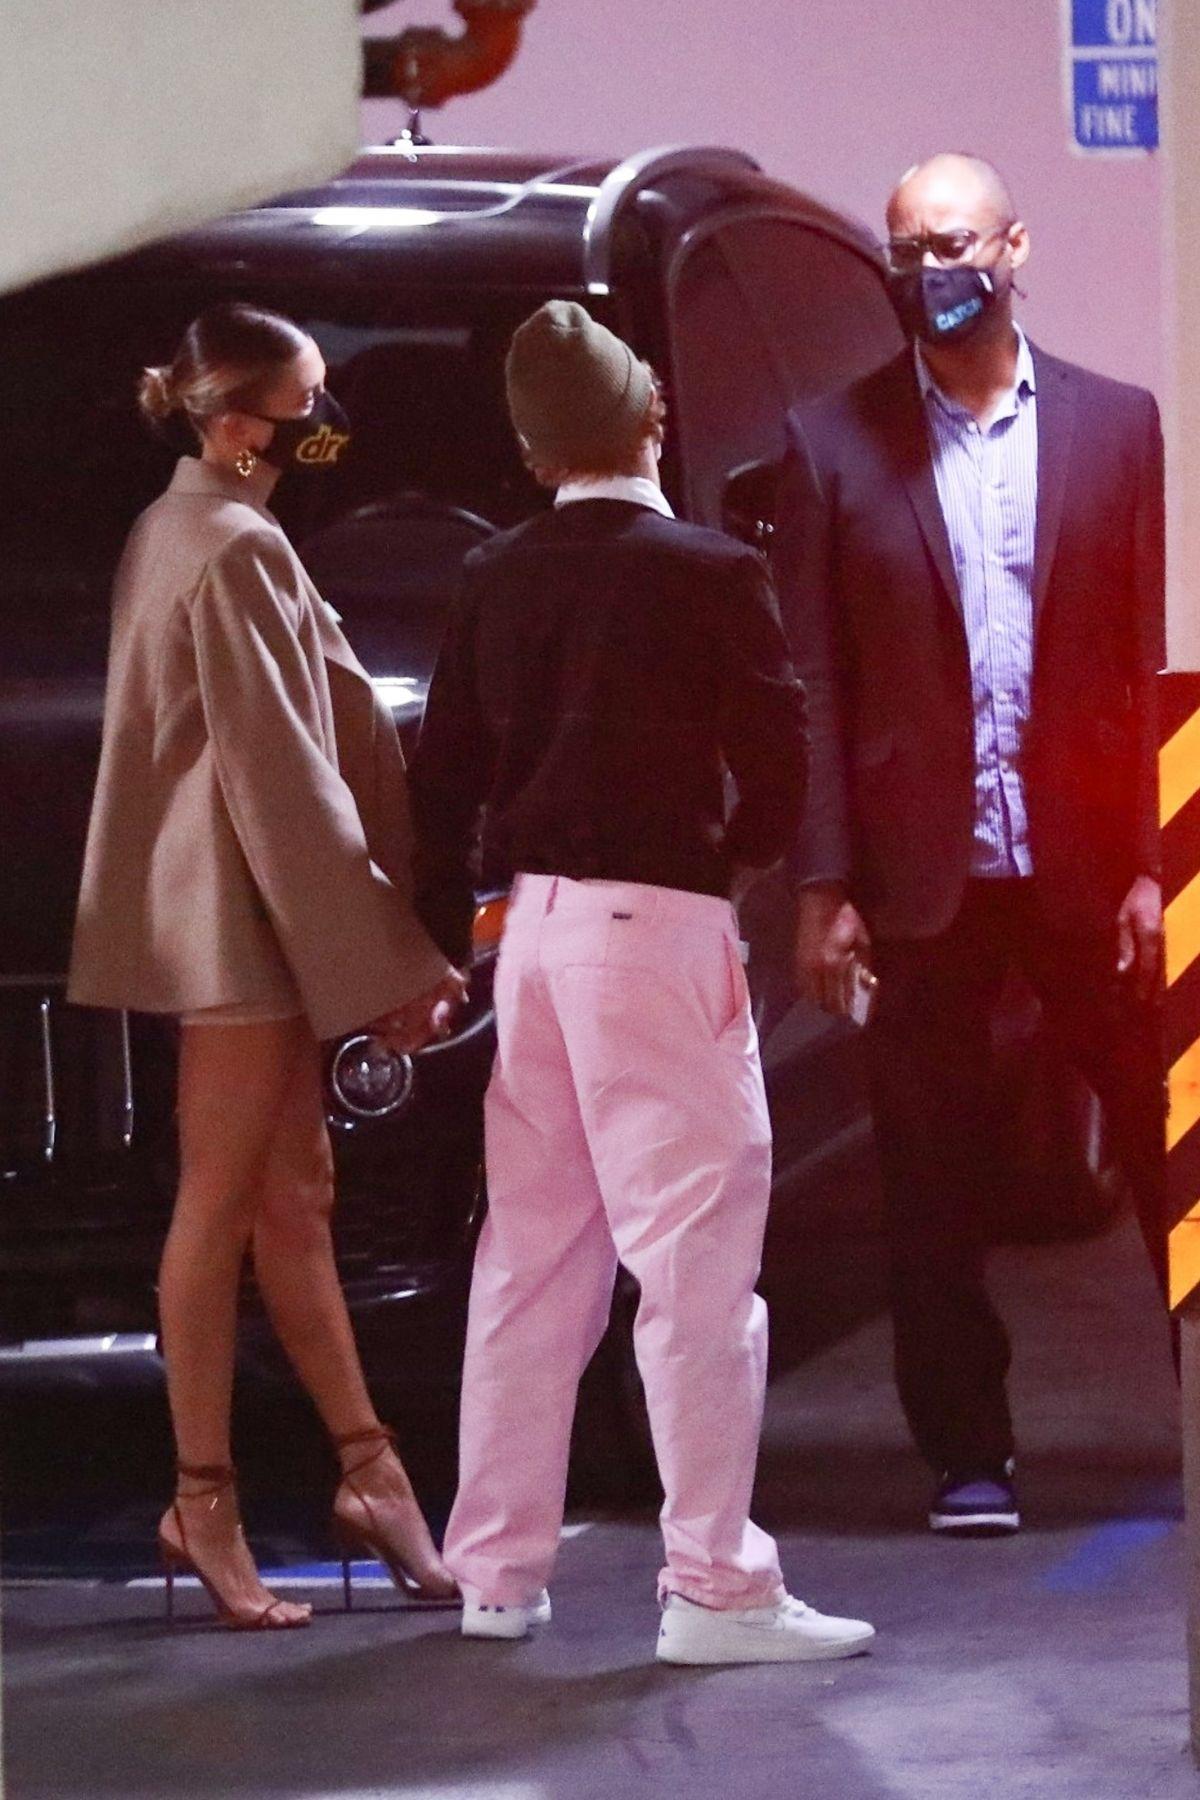 Hailey Justin Bieber Catch La West Hollywood